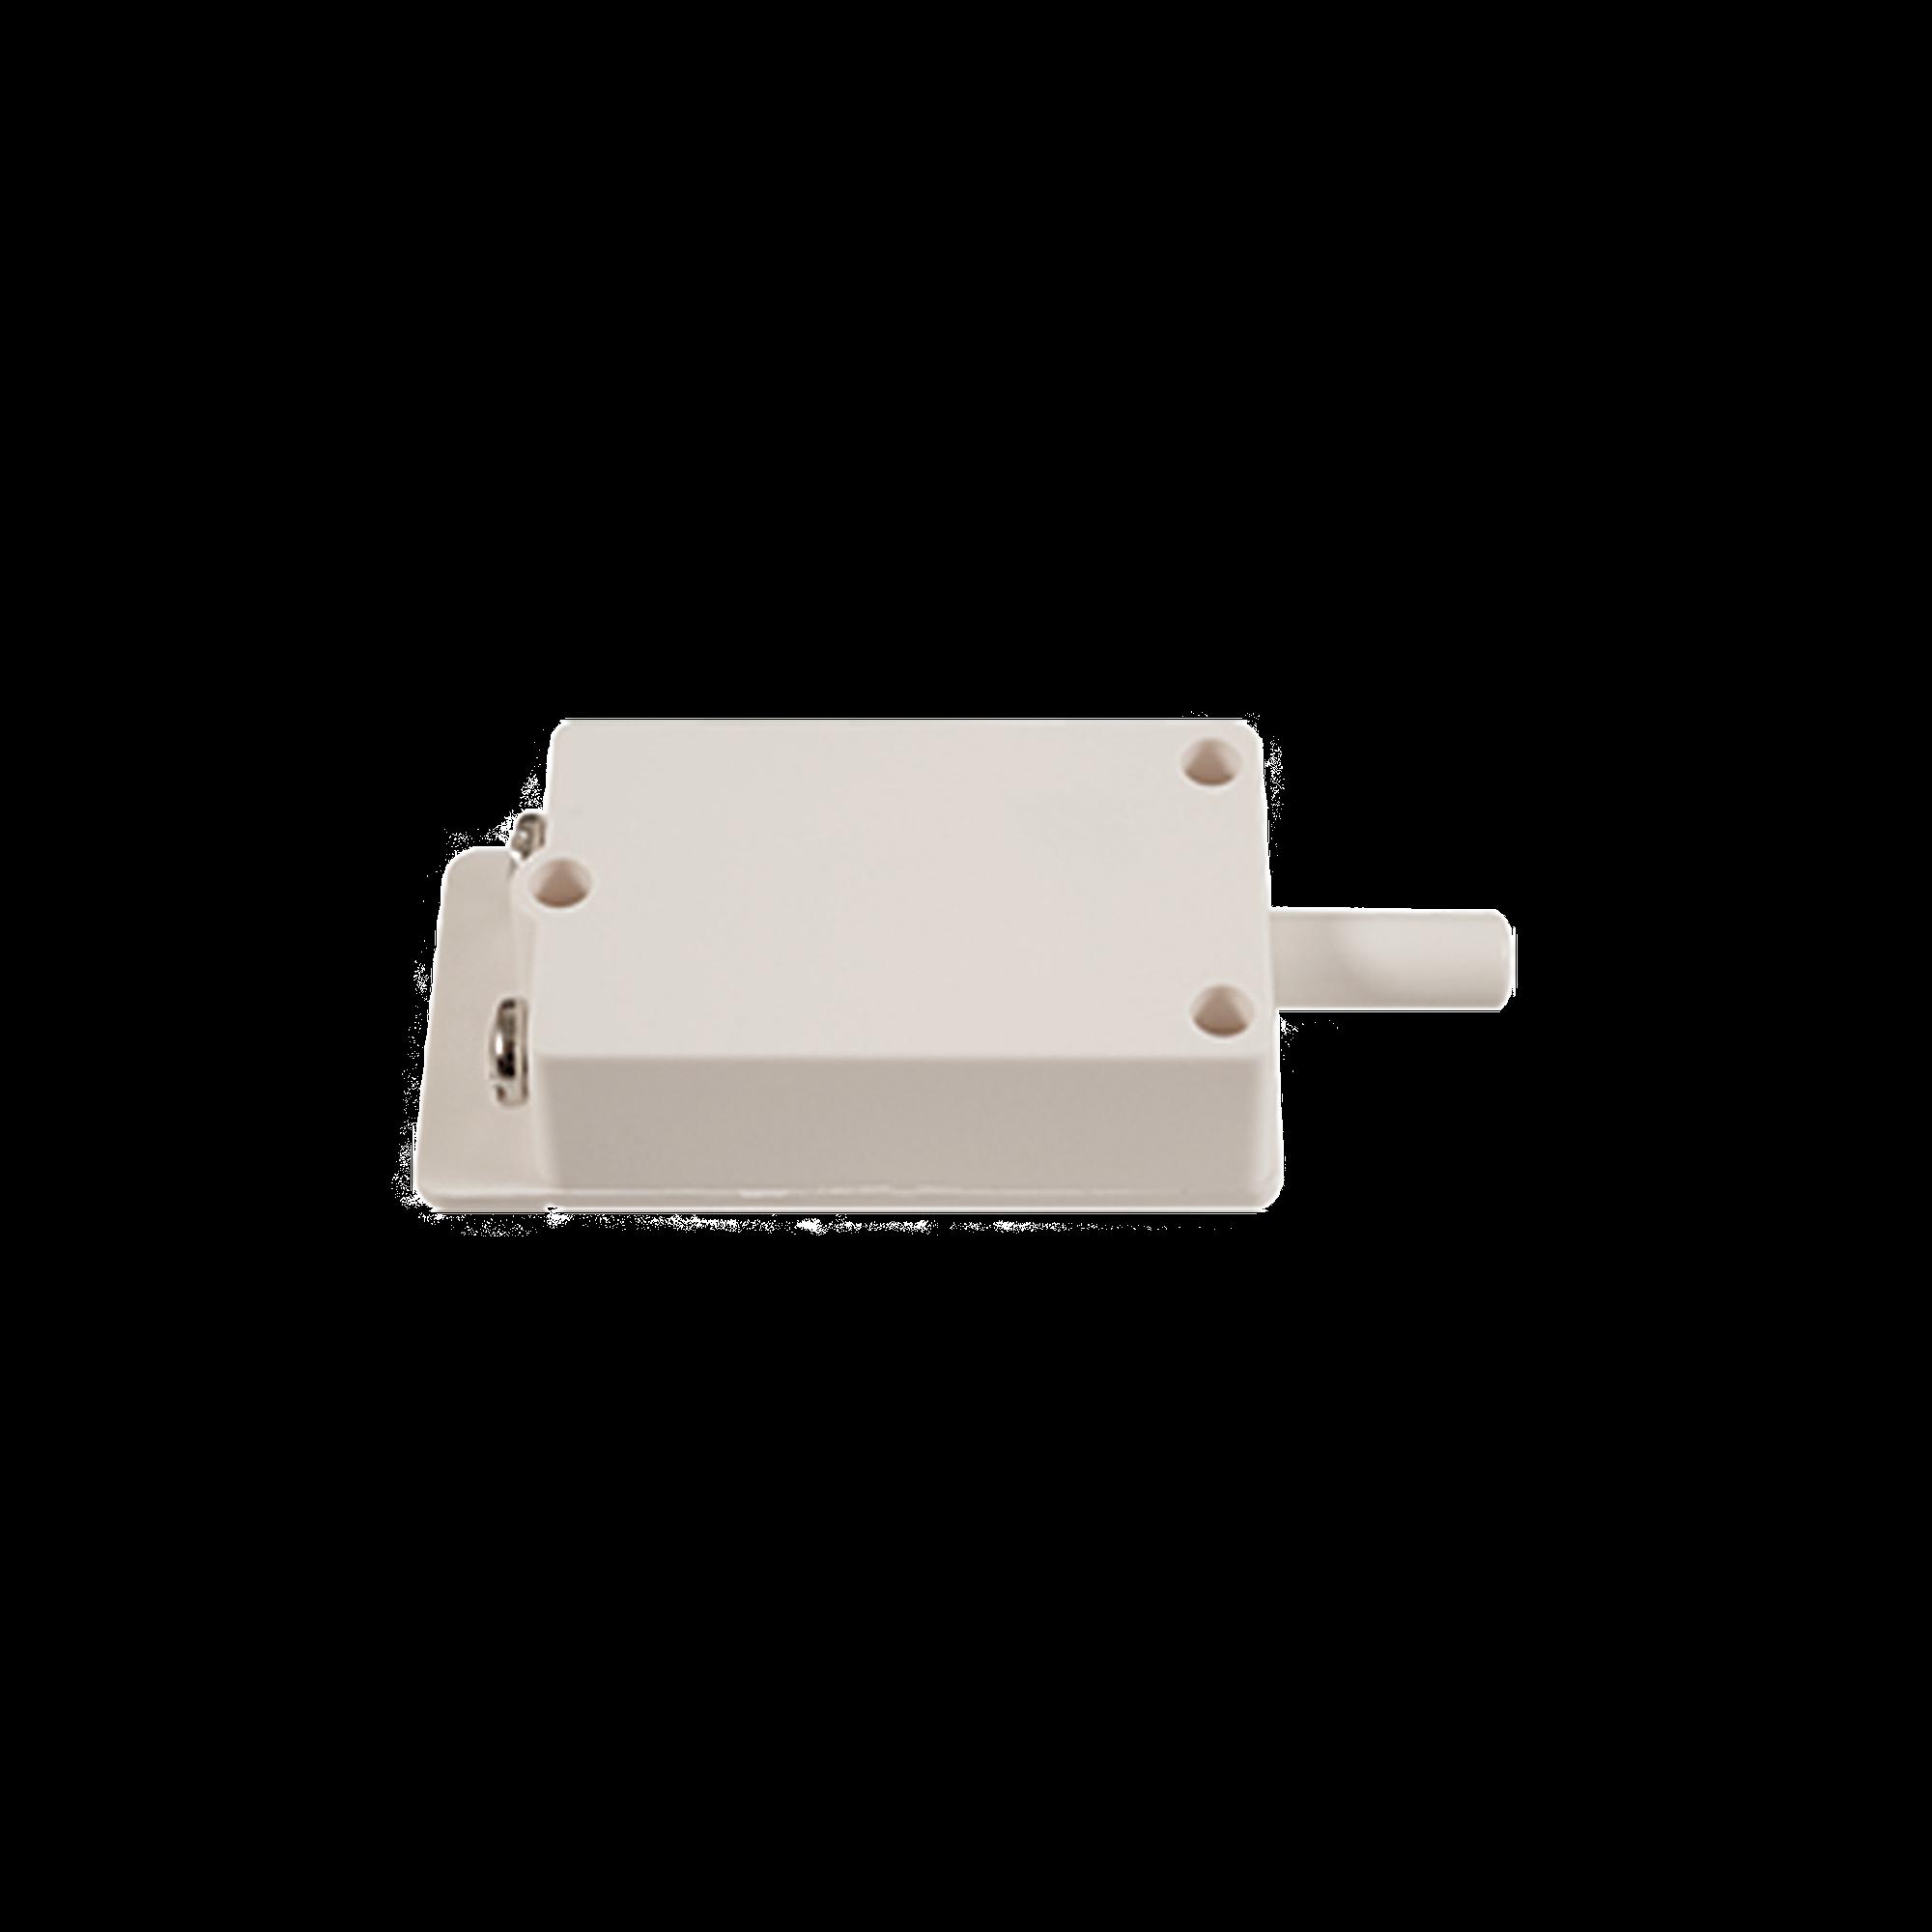 Tamper switch / Normalmente Abierto / Aplicacion para Paneles de alarma, Gabientes, paneles de acceso, etc / Facil uso